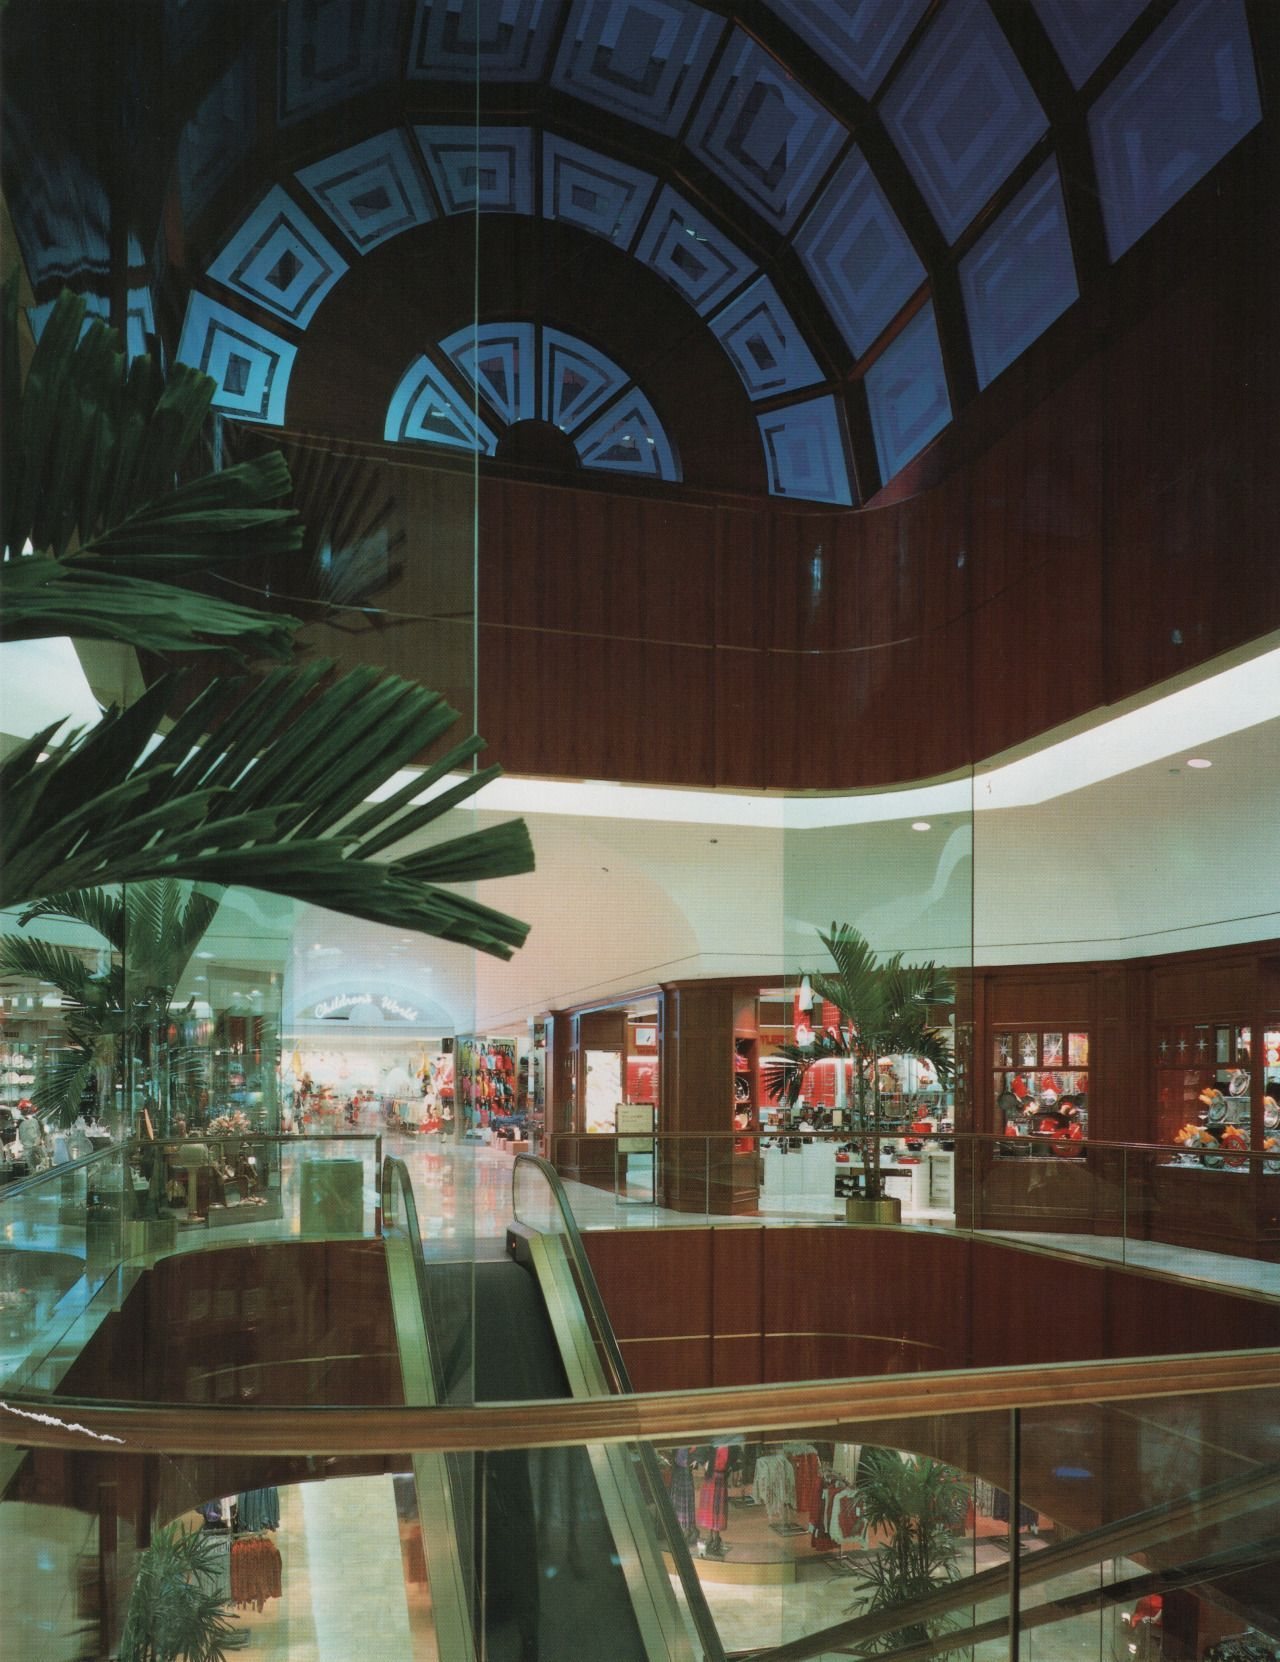 Macys   galleria dallas texasfrom the best of store designs also nostalgia images in rh pinterest